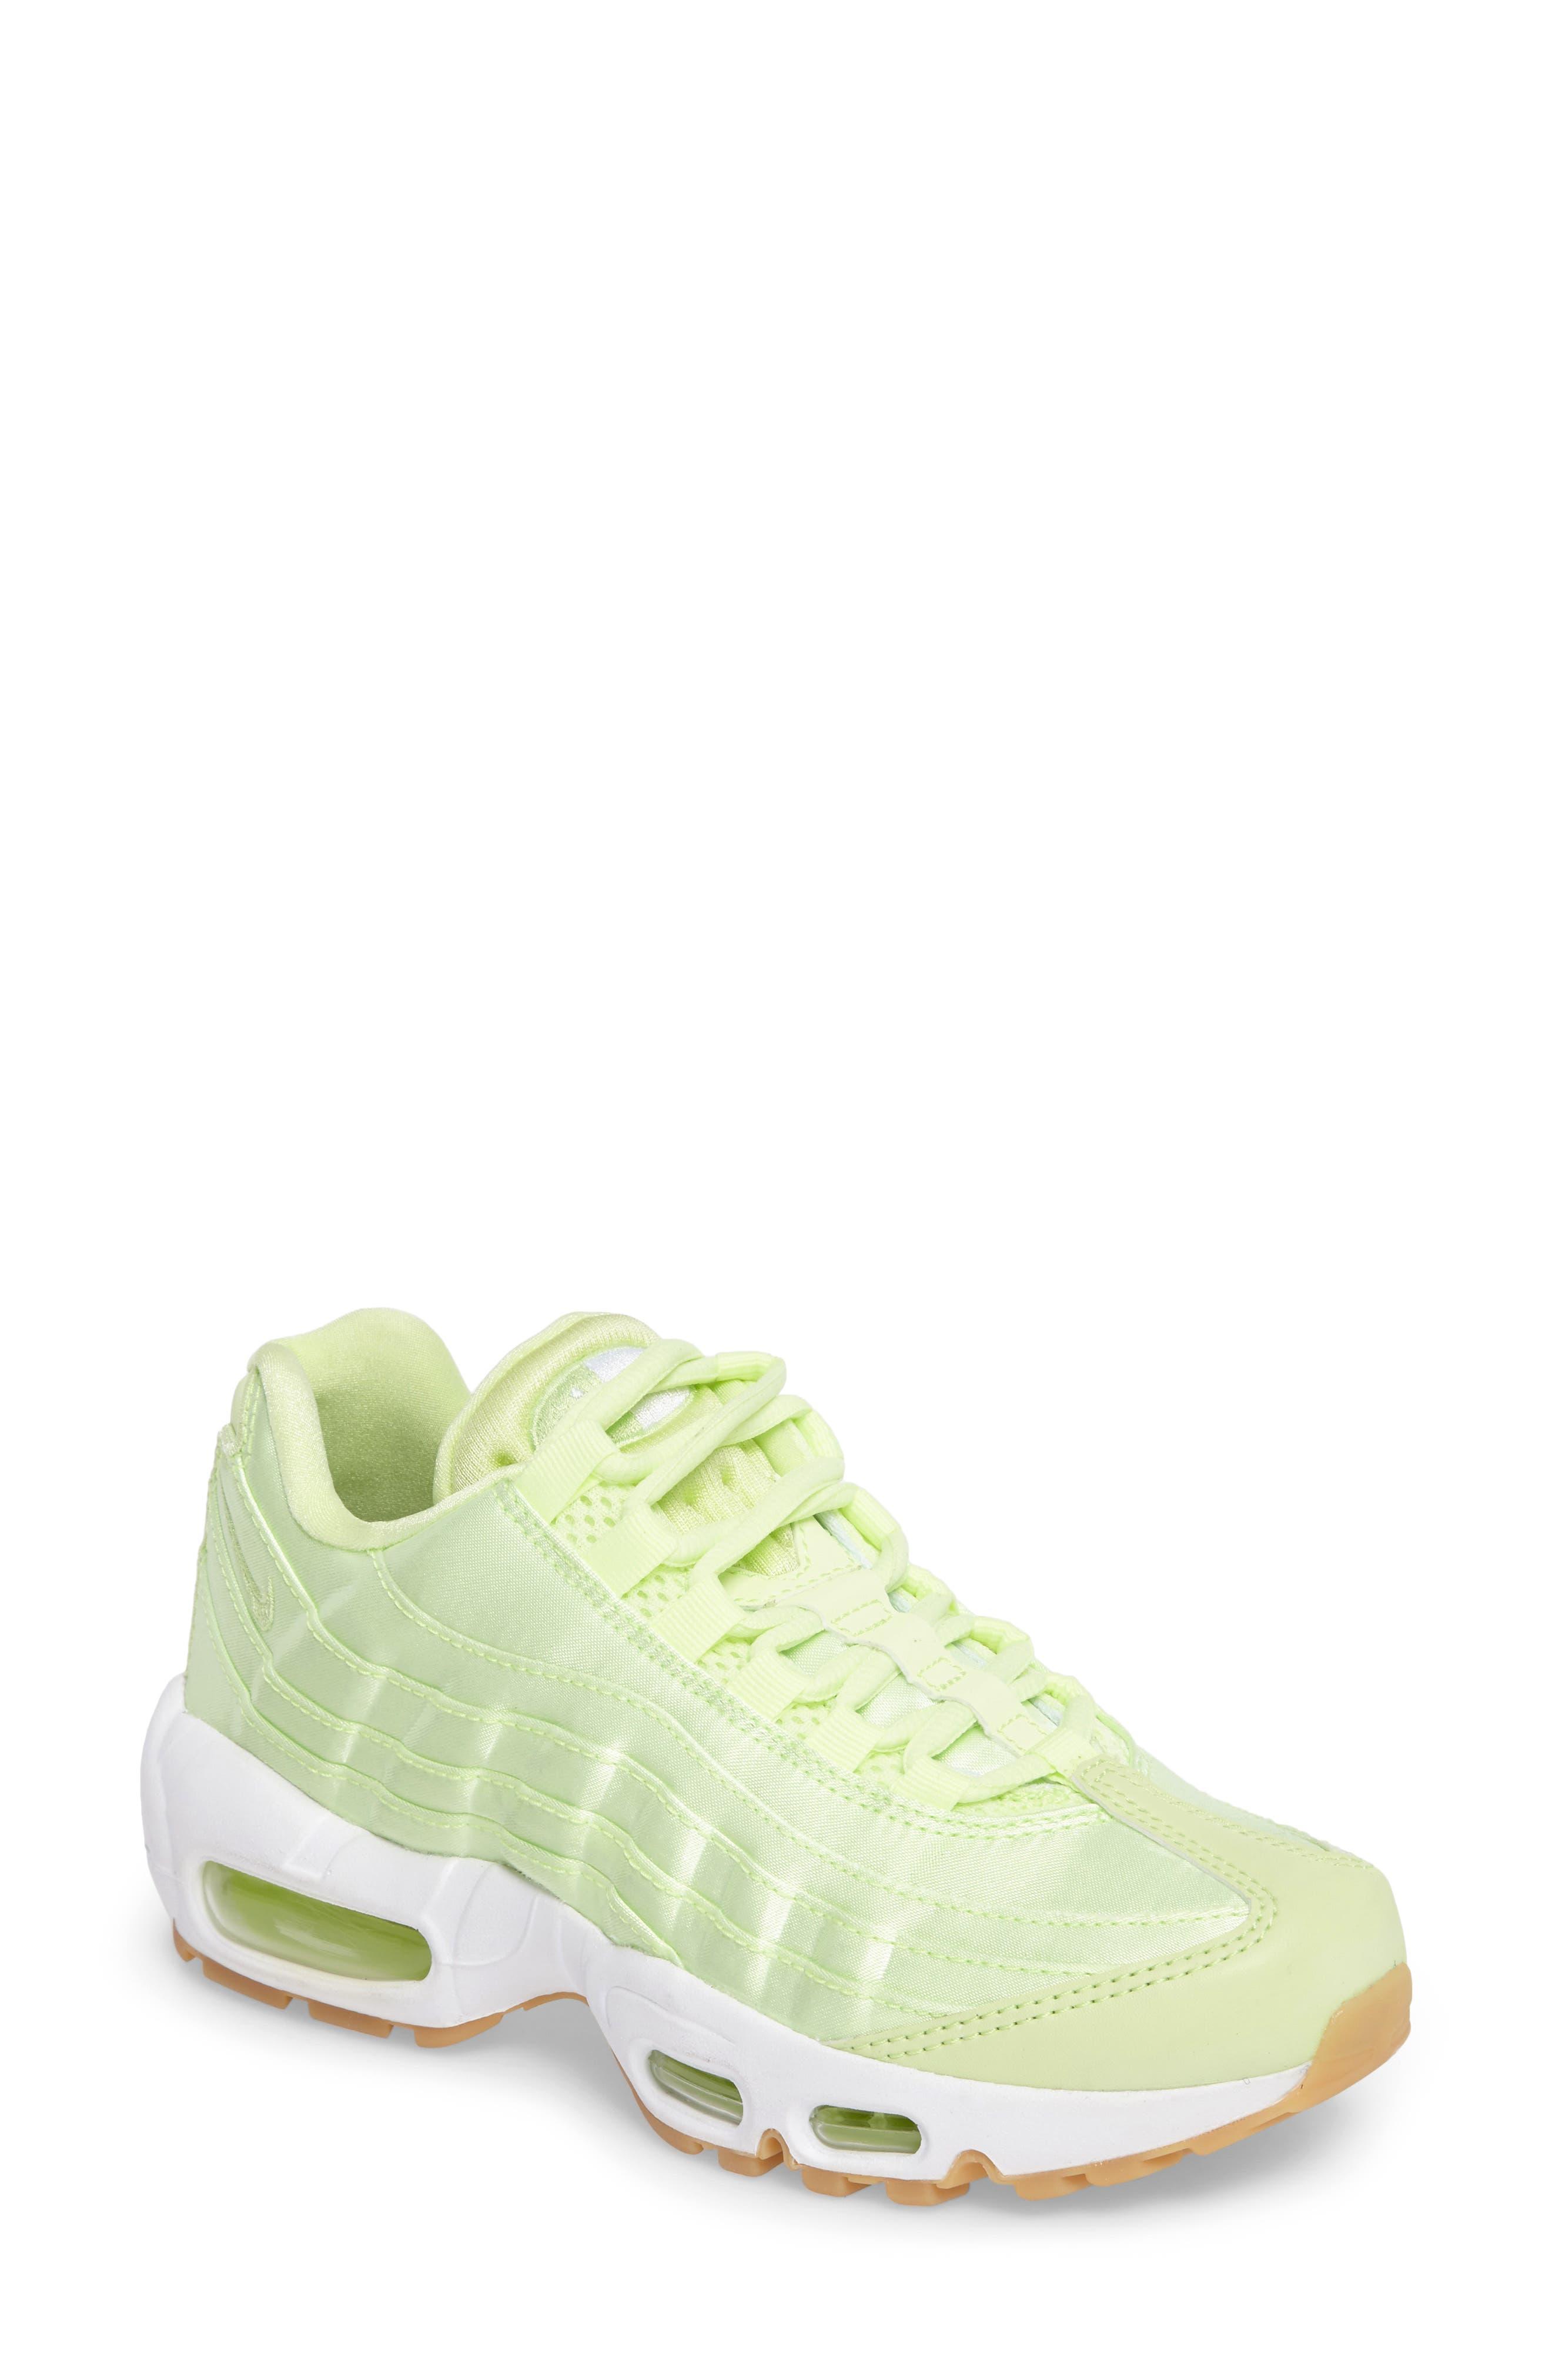 Air Max 95 QS Running Shoe,                         Main,                         color, 300